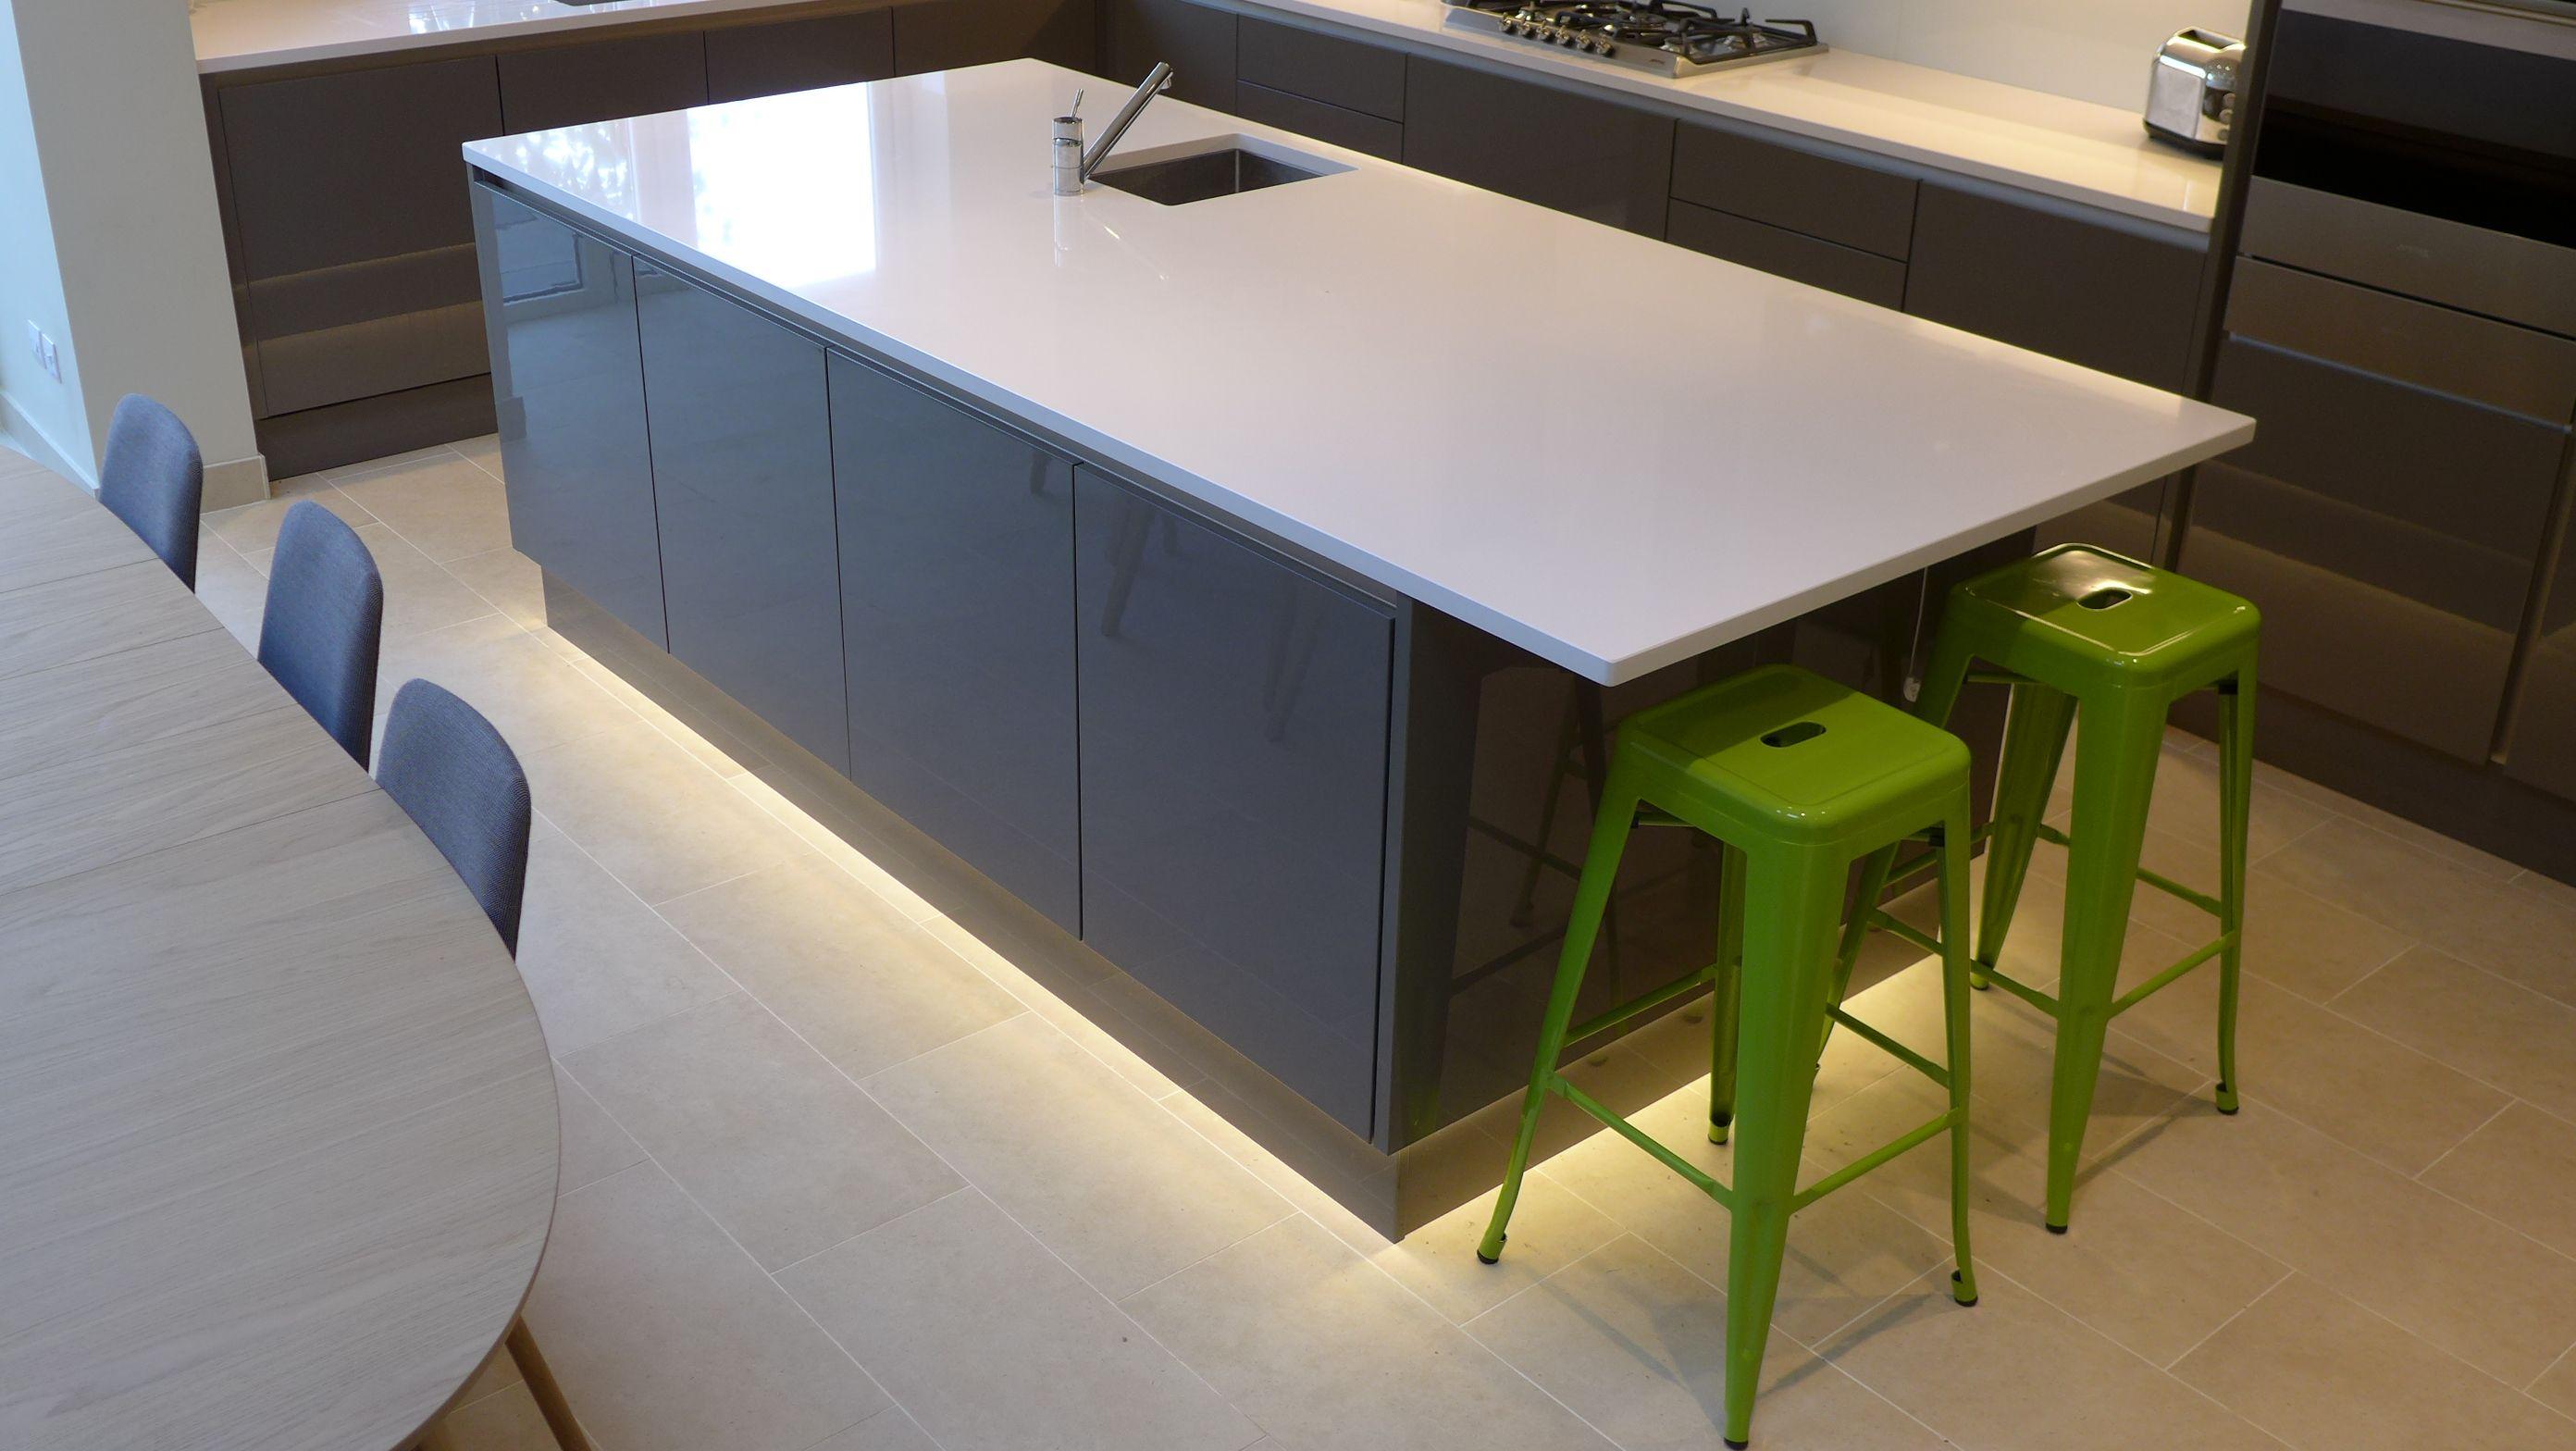 LED Plinth Light Around Base Of Gloss Grey Kitchen Island With - Kitchen plinth lights white